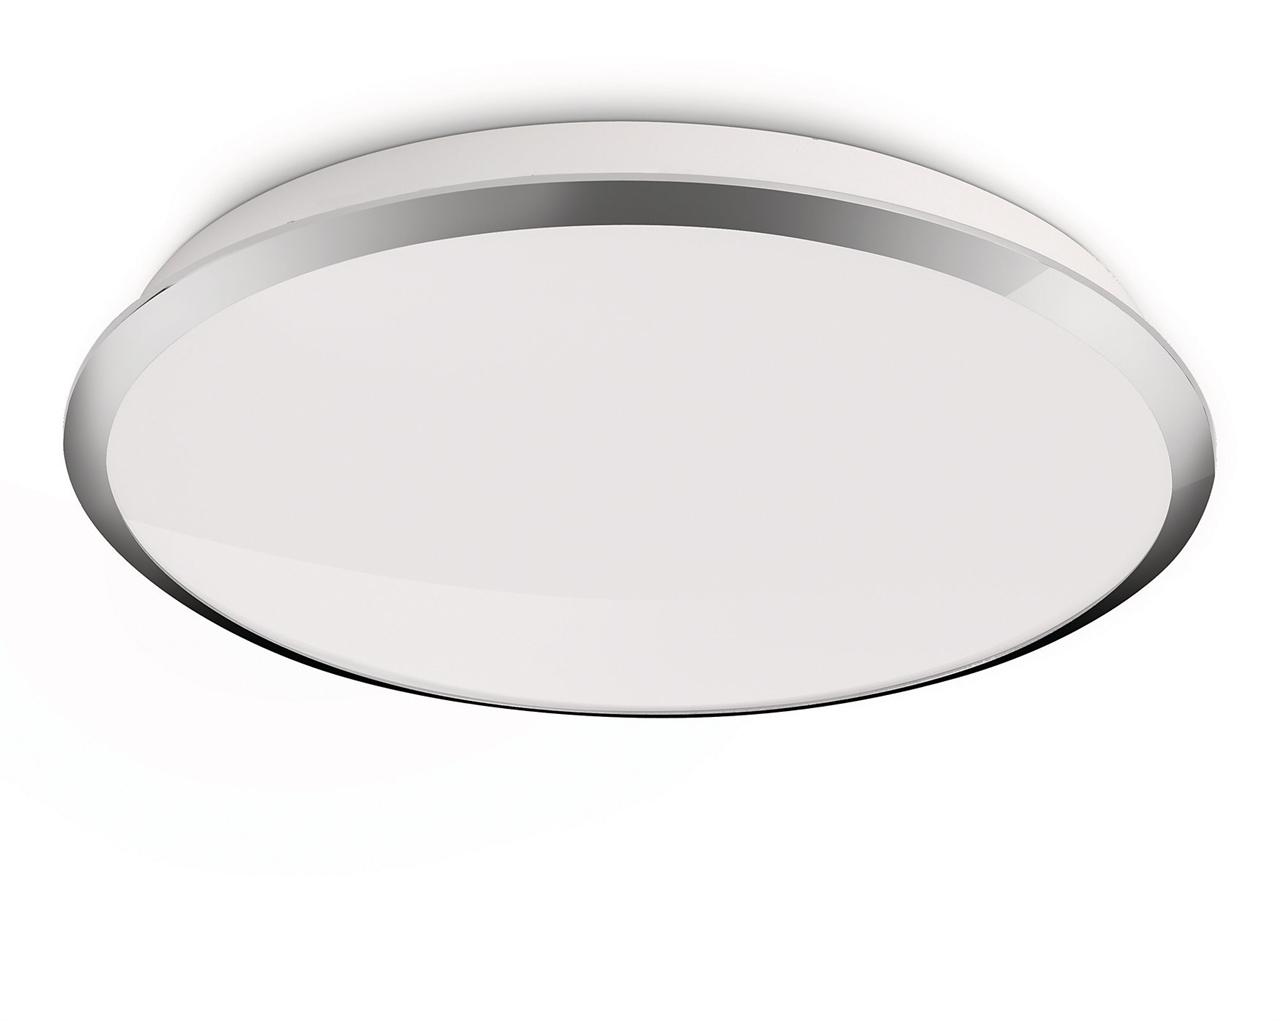 K Lighting Supplies – Indoor, Outdoor & Led Lighting Specialists Within Philips Outdoor Ceiling Lights (#6 of 15)